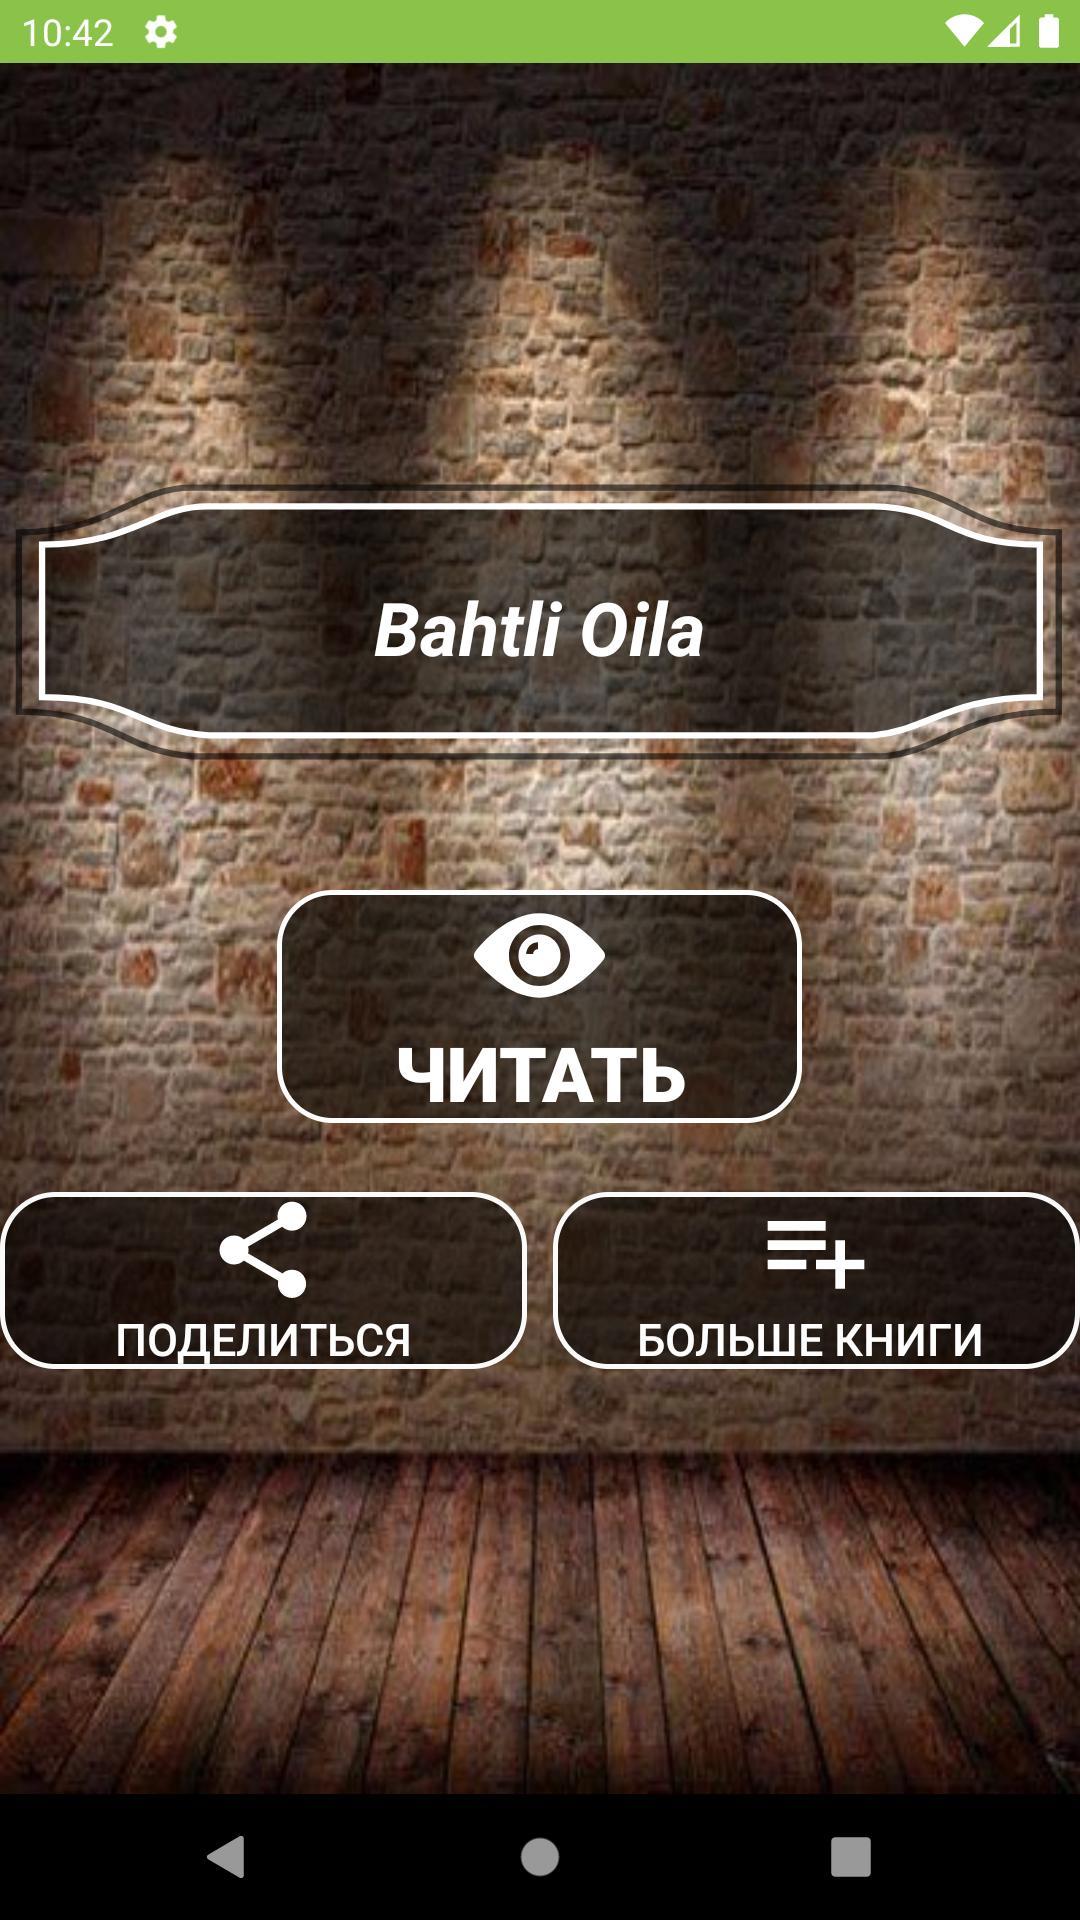 Baxtiyor oila kitobi pdf